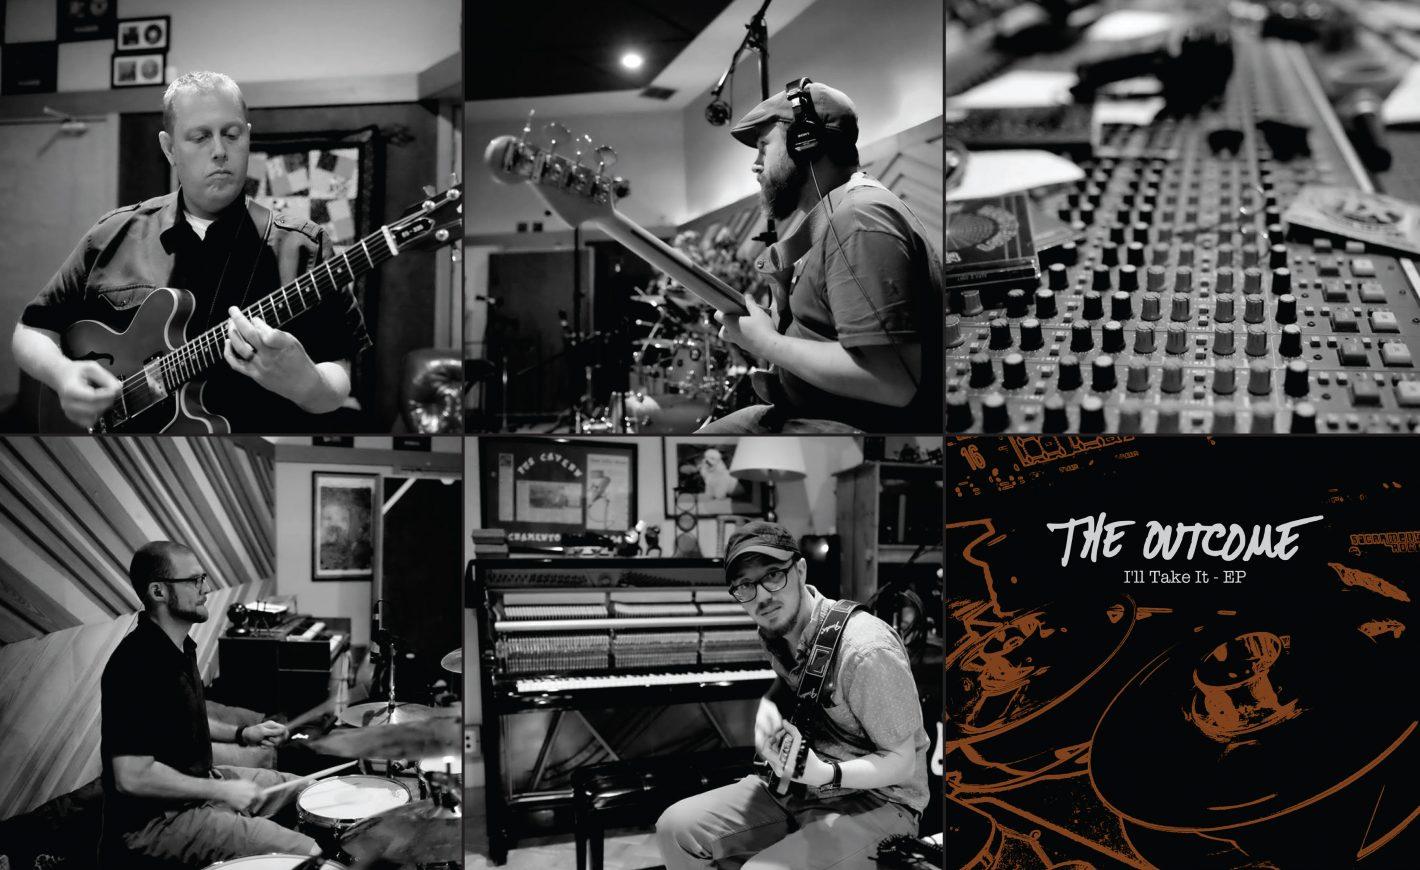 The Outcome EP Release